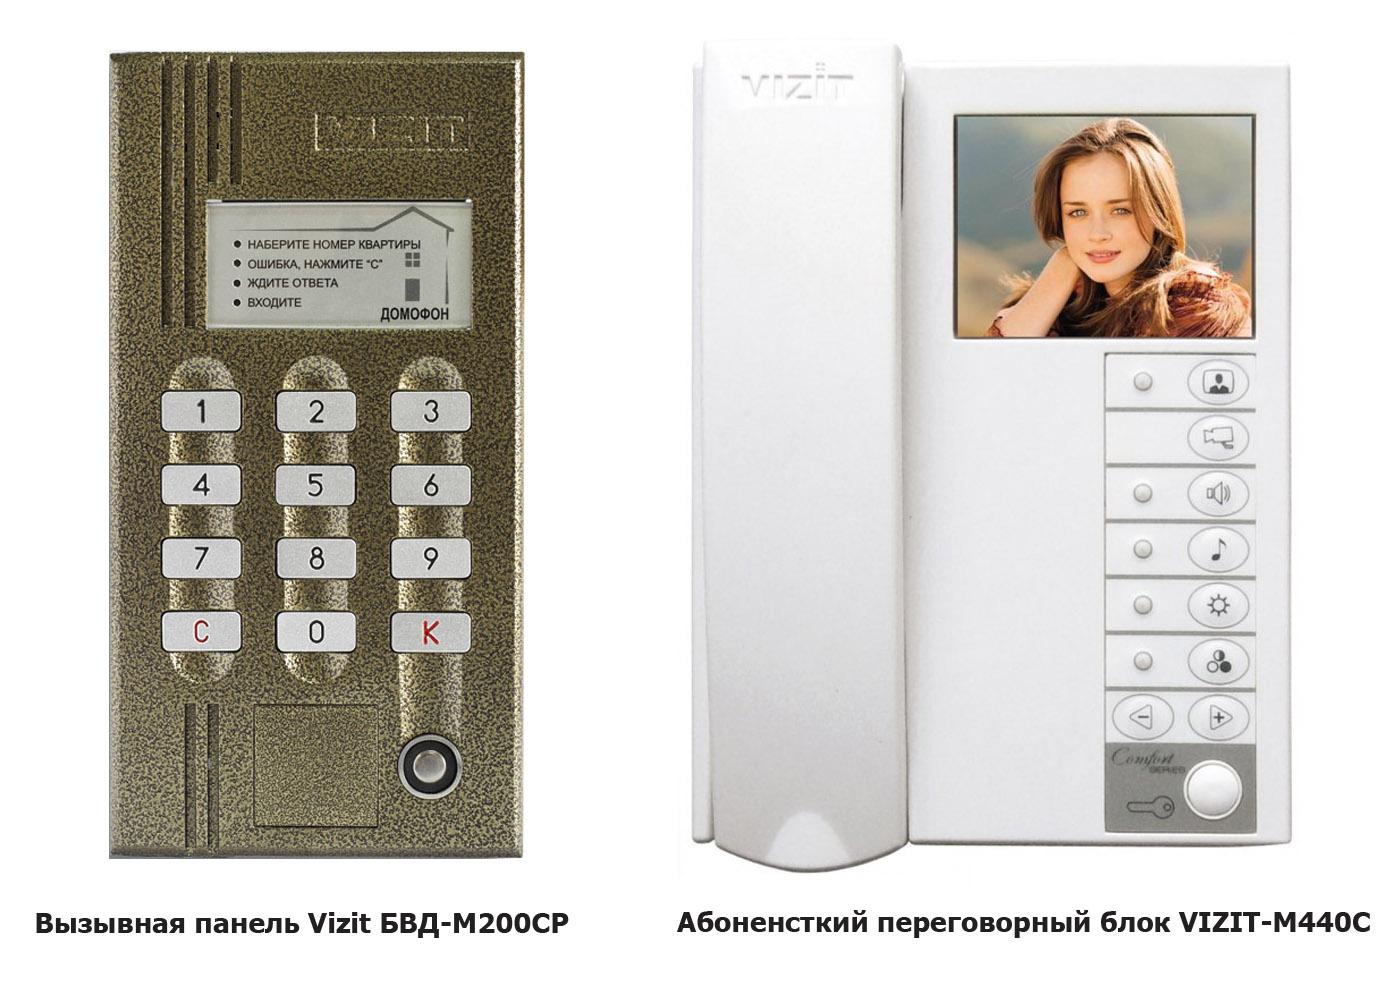 Vizit БВД-М200CP и абонентский блок VIZIT-M440C